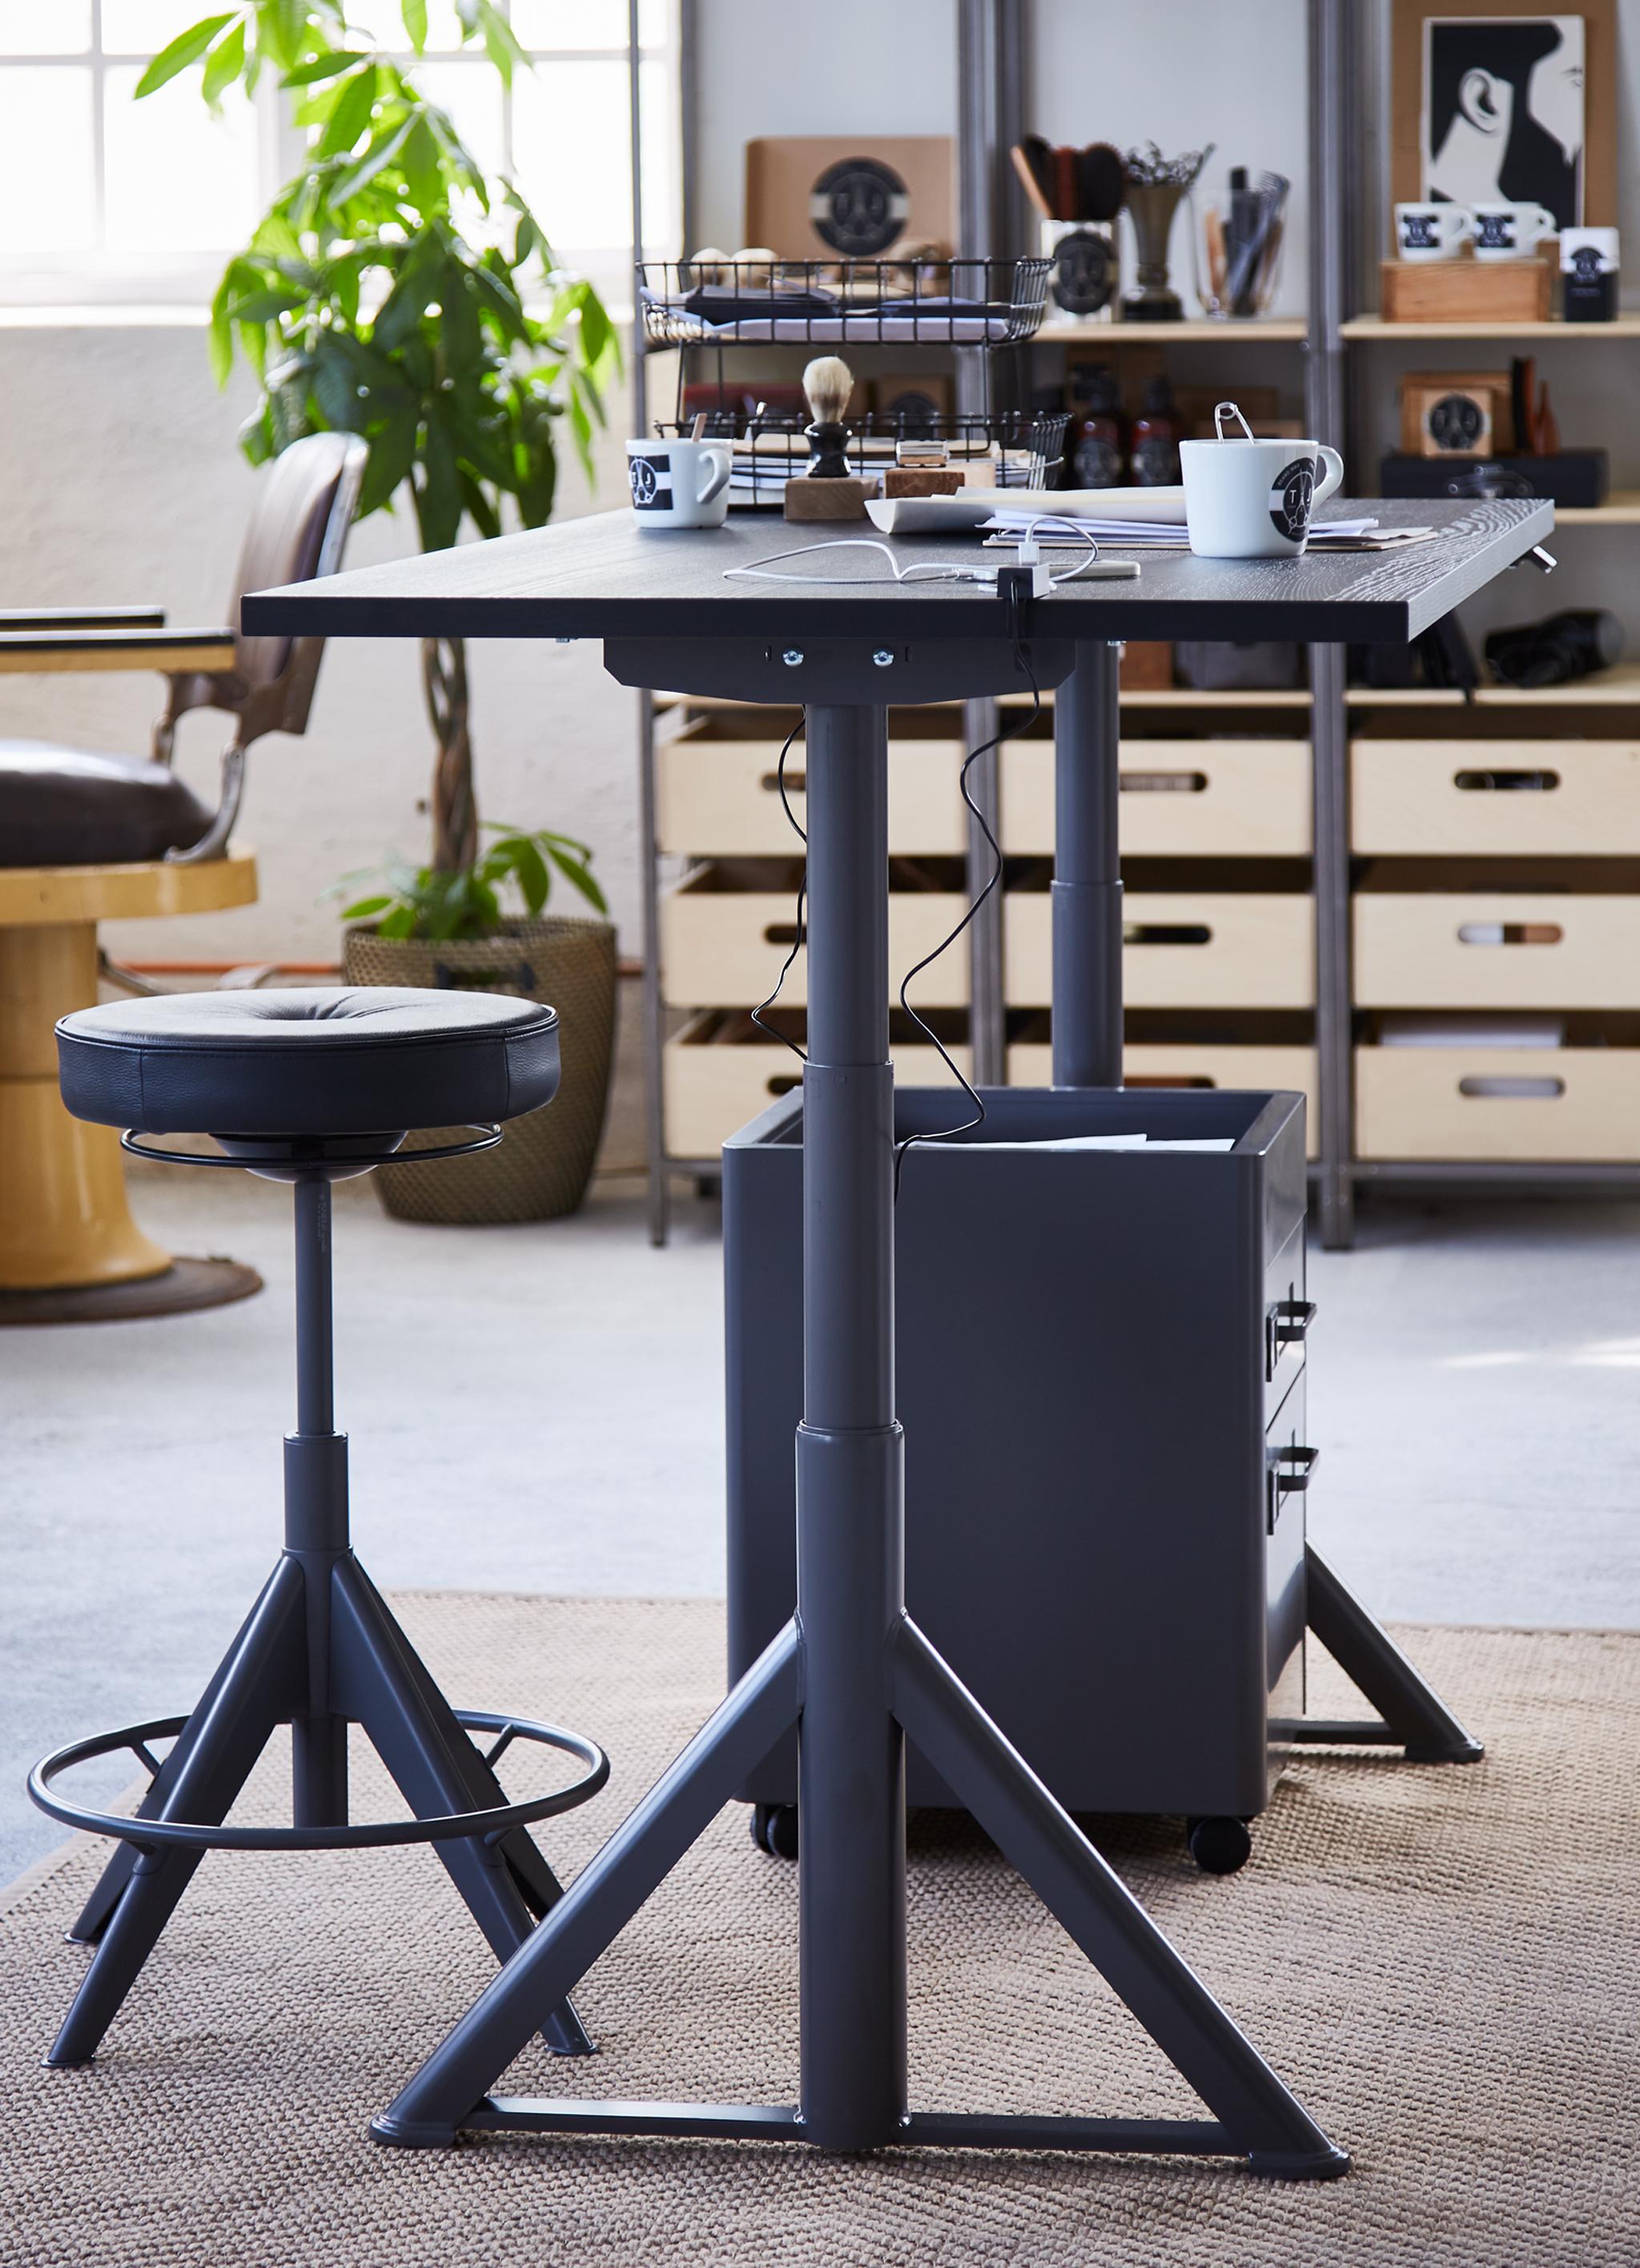 Una oficina con clase - IKEA